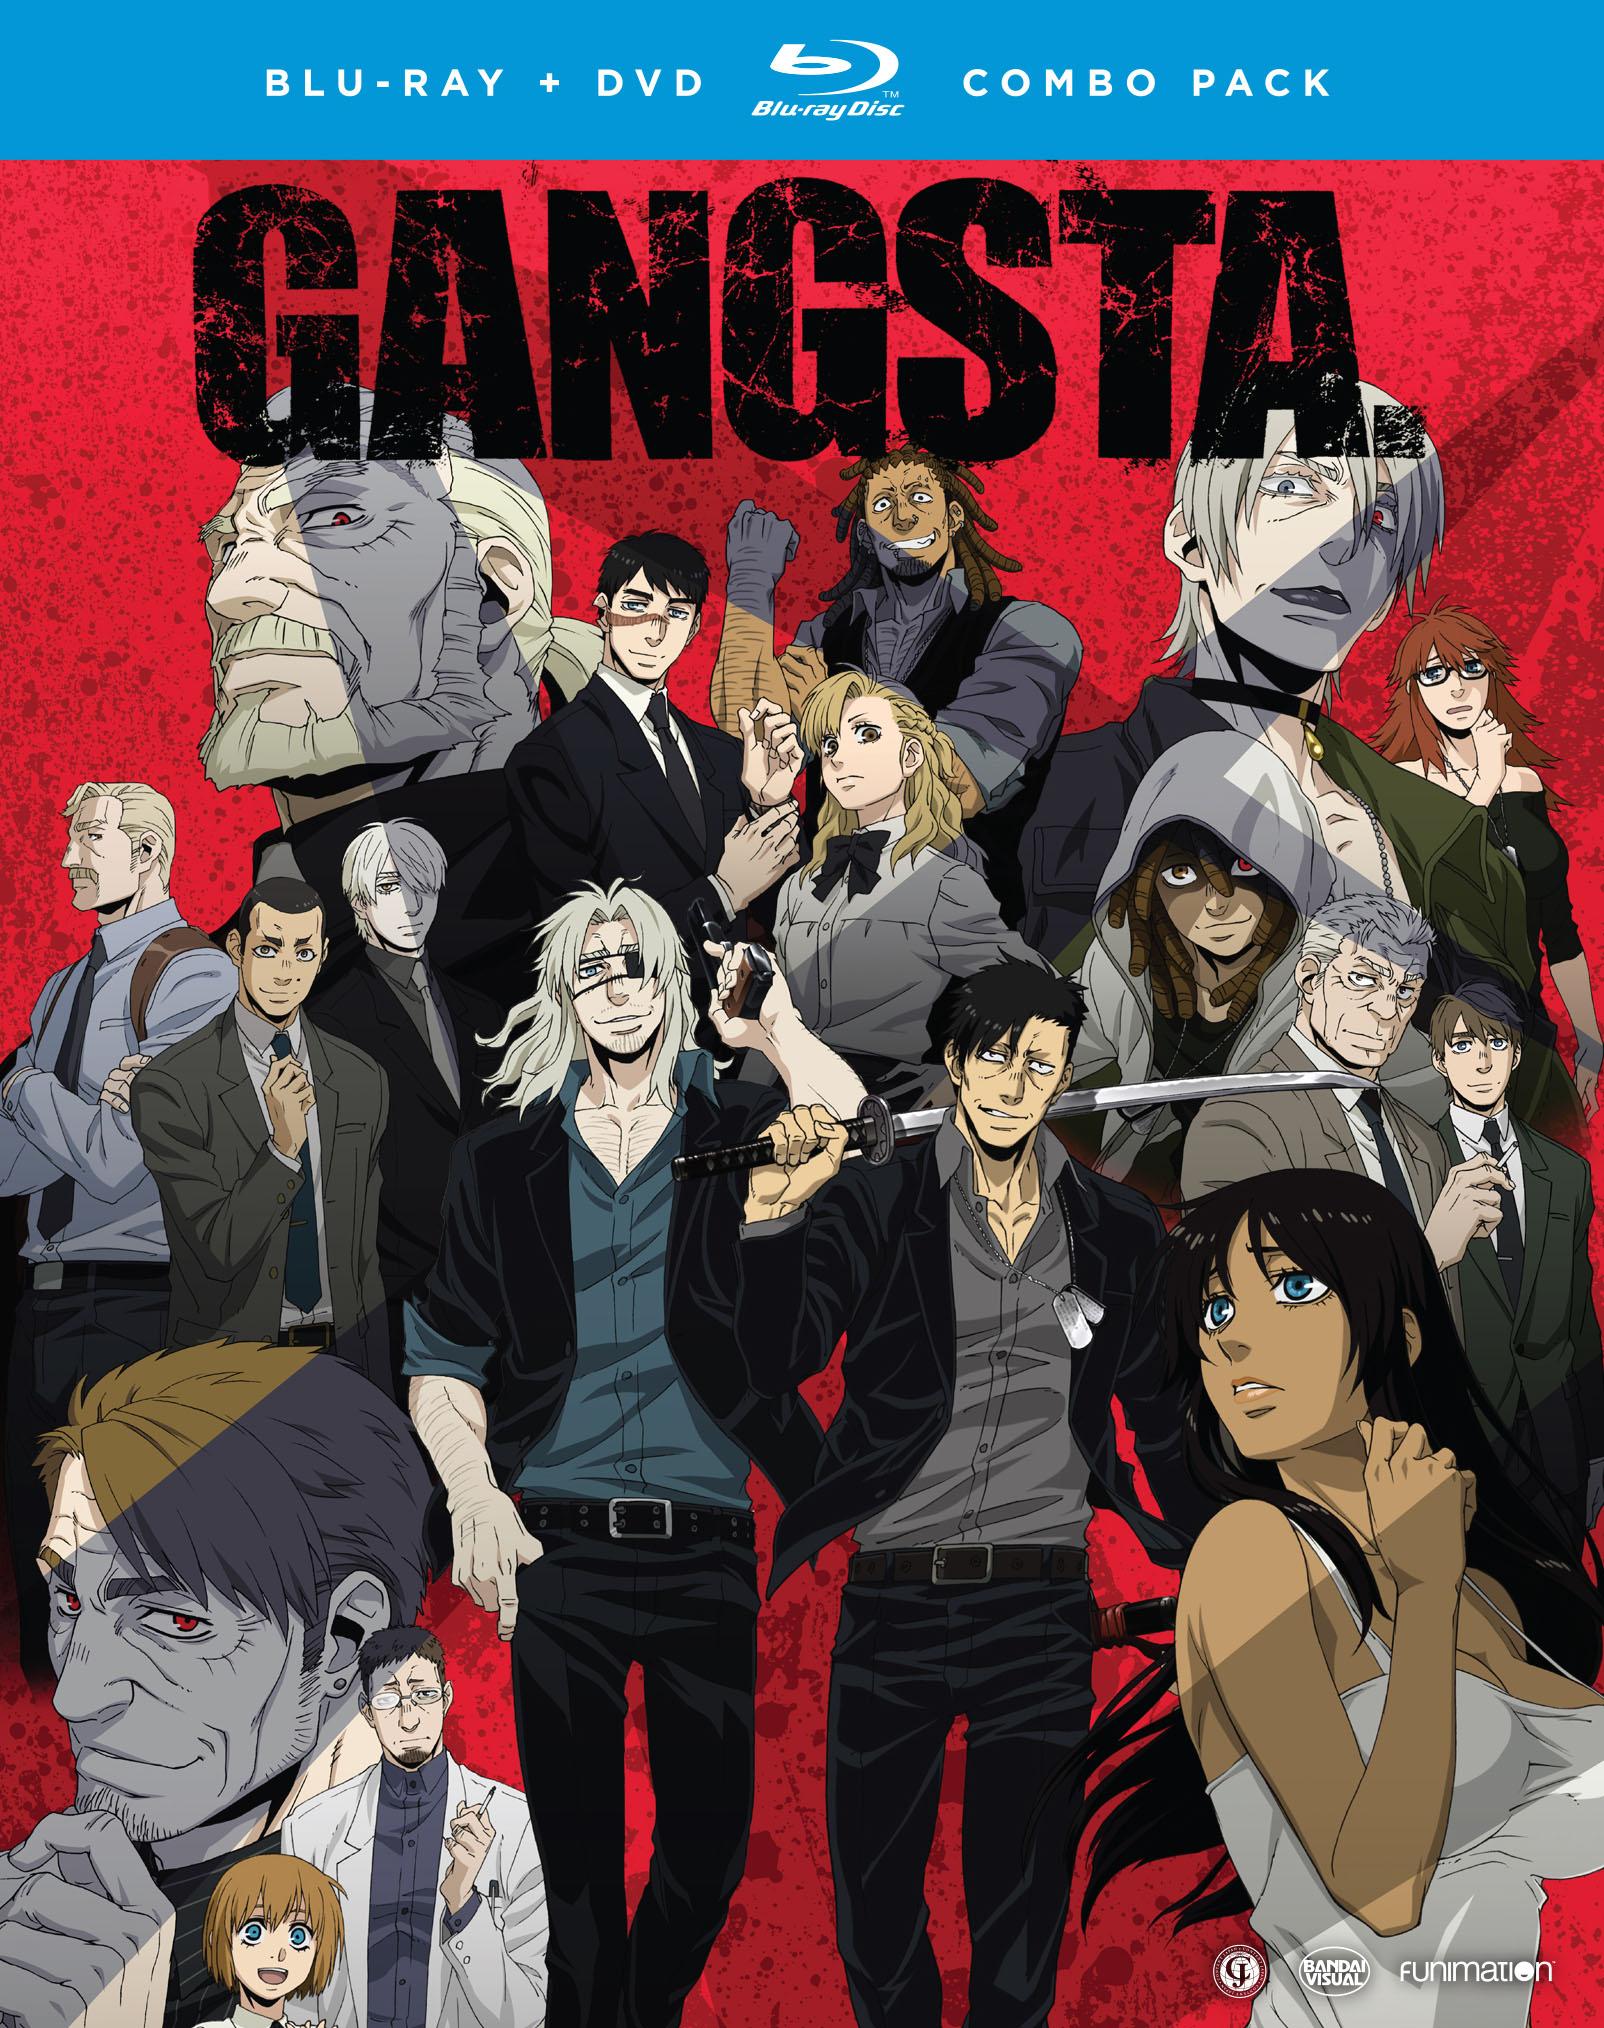 GANGSTA Complete Series Blu-ray/DVD